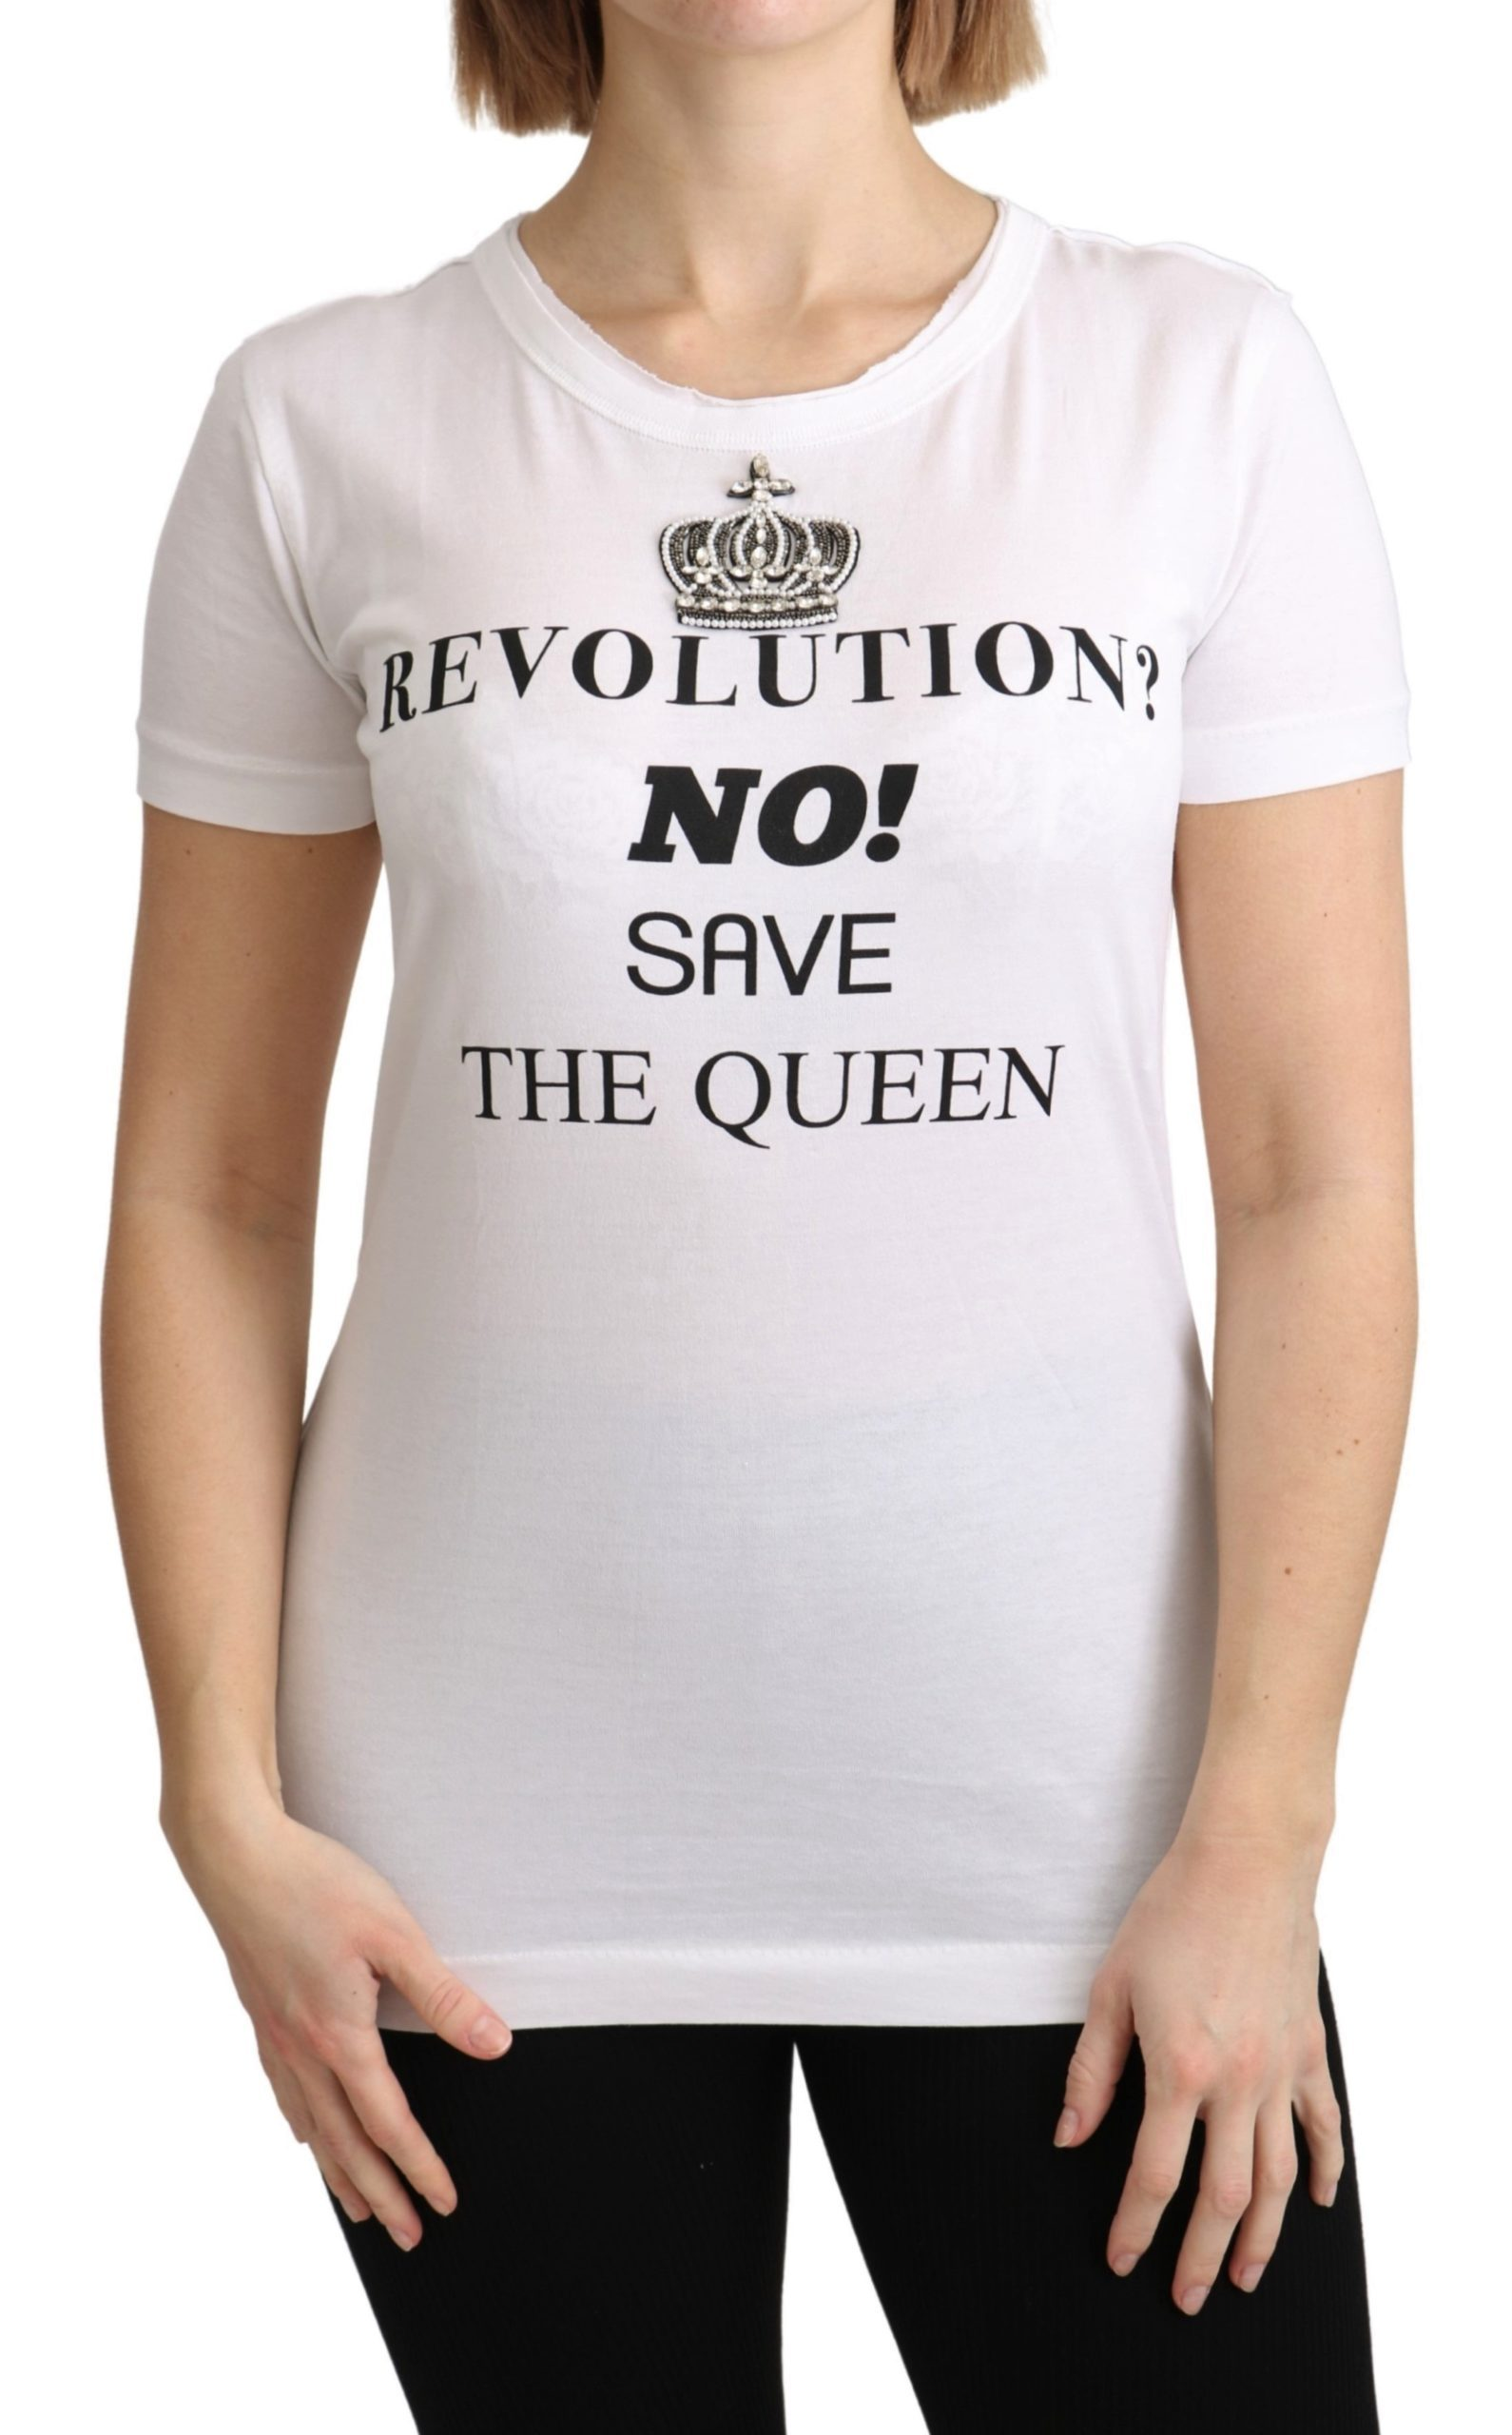 Dolce & Gabbana Women's The Queen Crystal Crewneck T-Shirt White TSH4876 - IT40 S